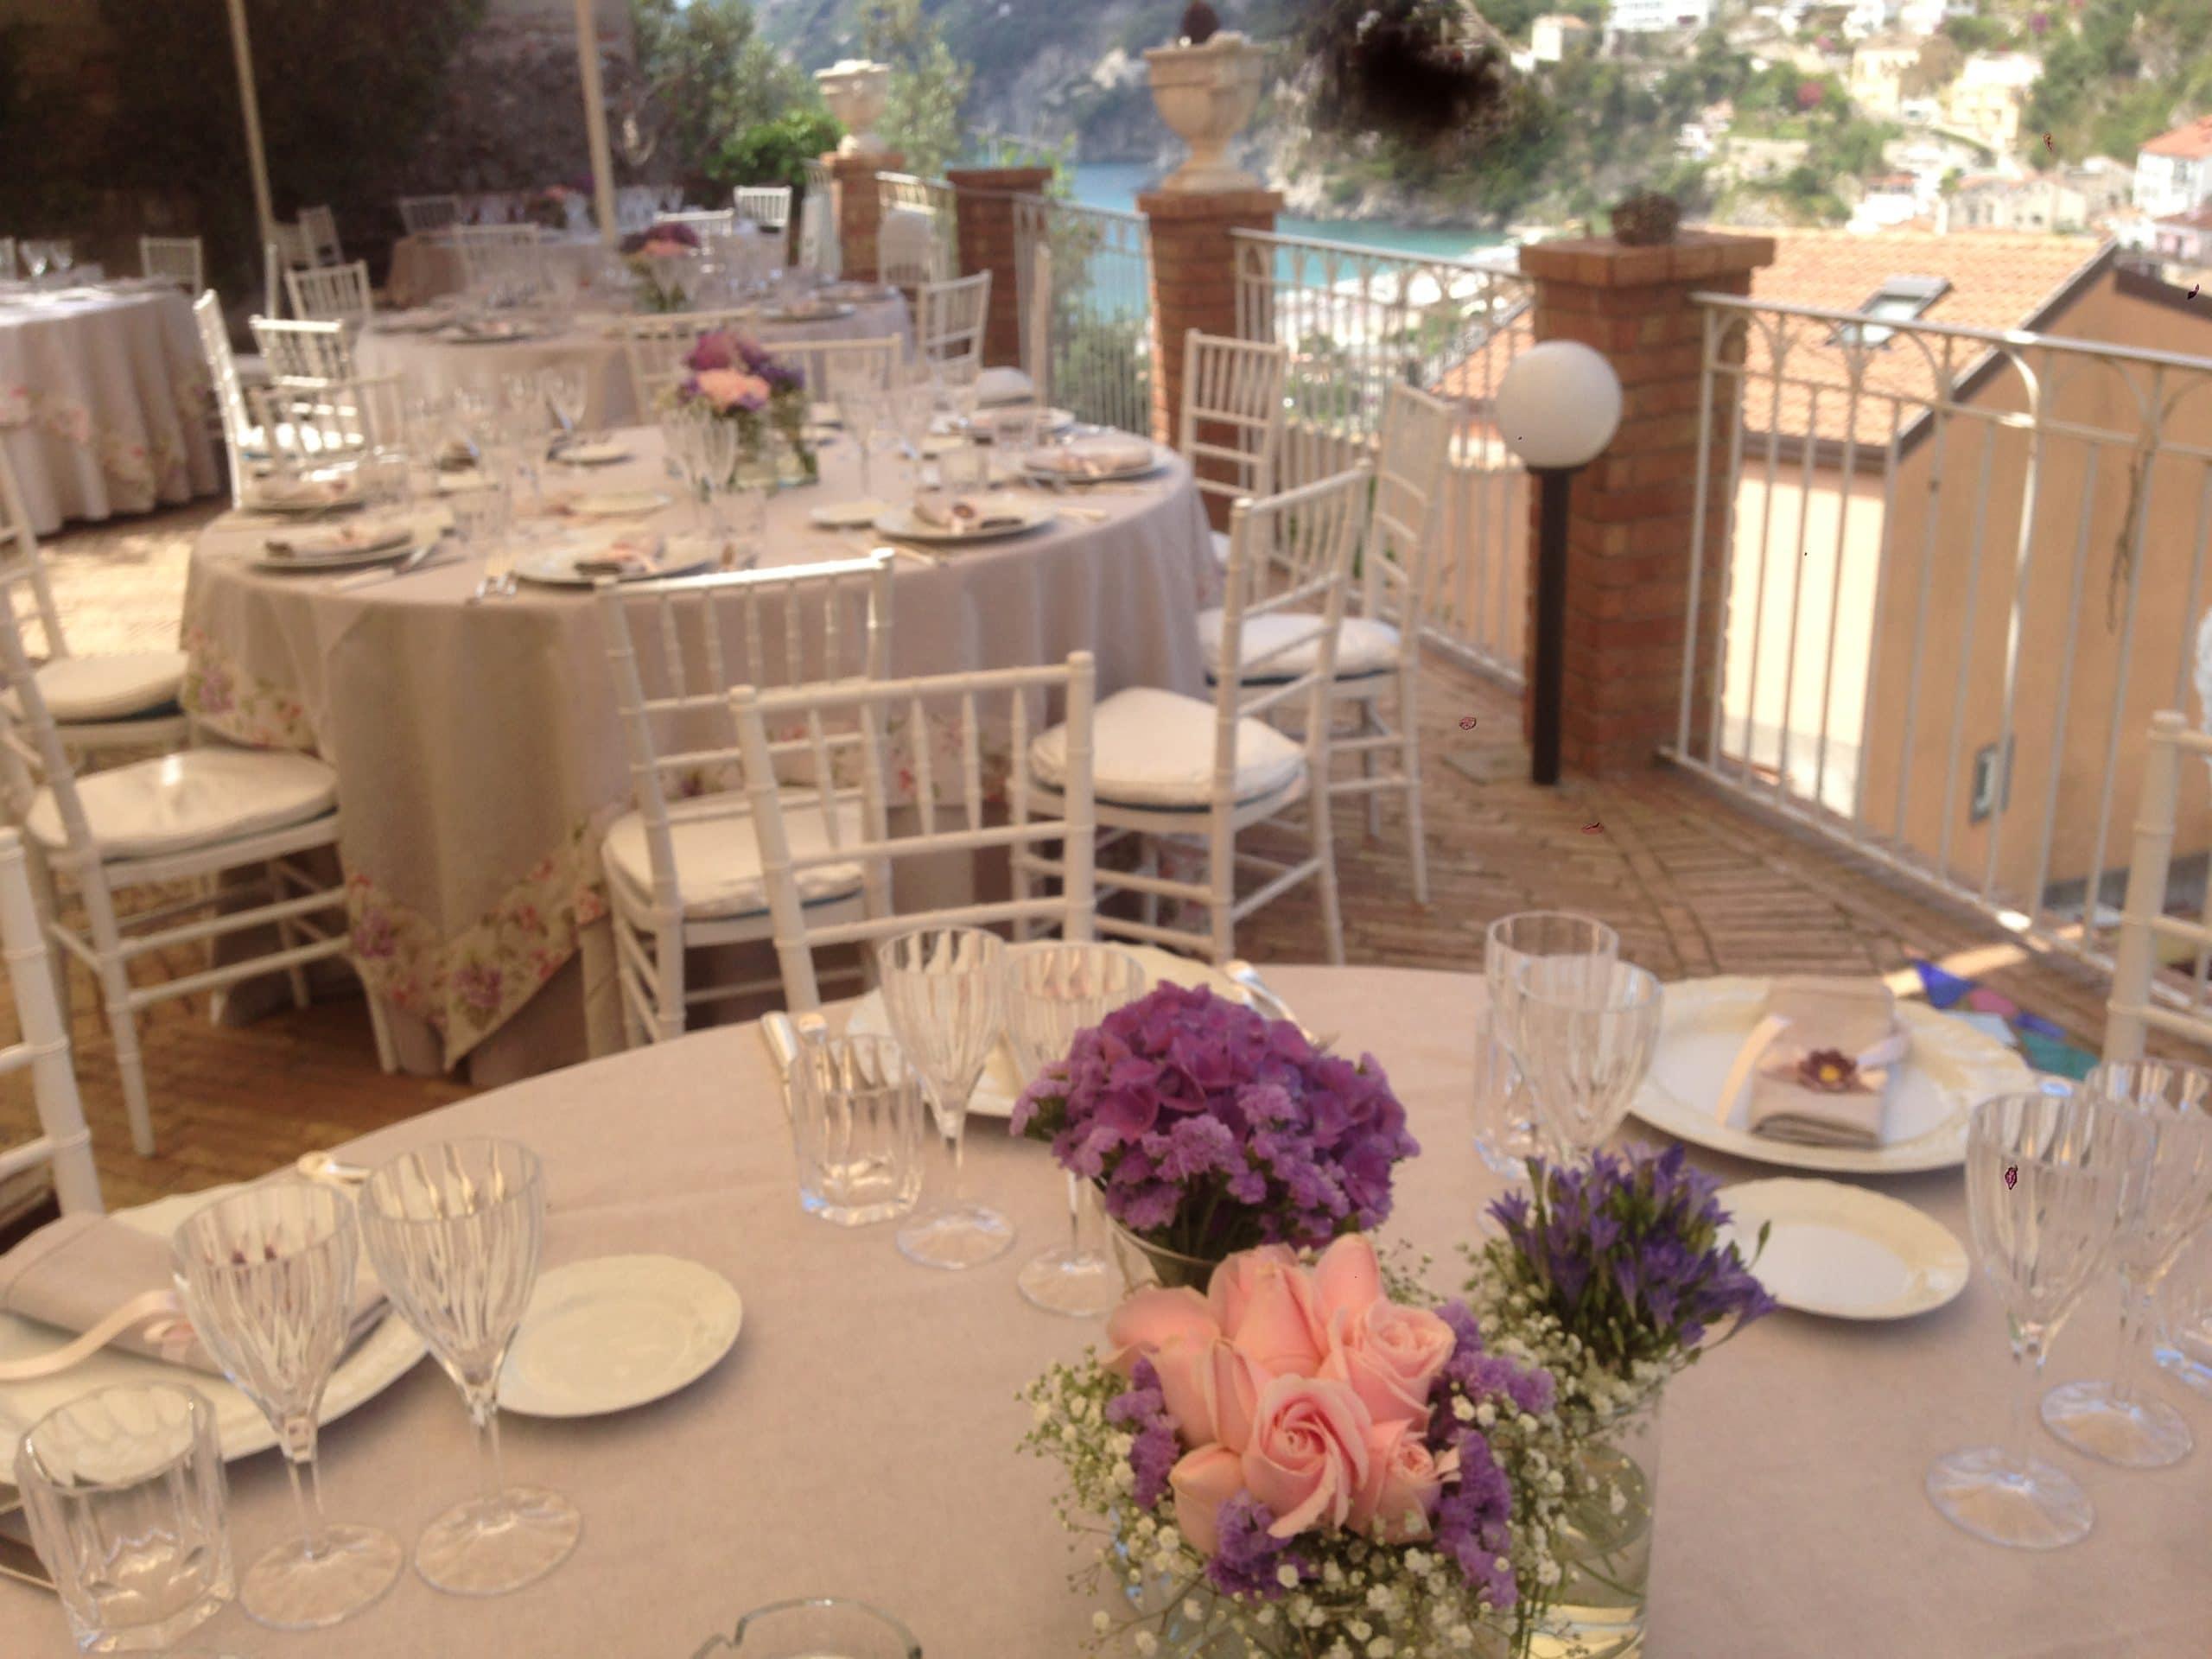 Allestimento tavolo nel giardino hotel vietri coast